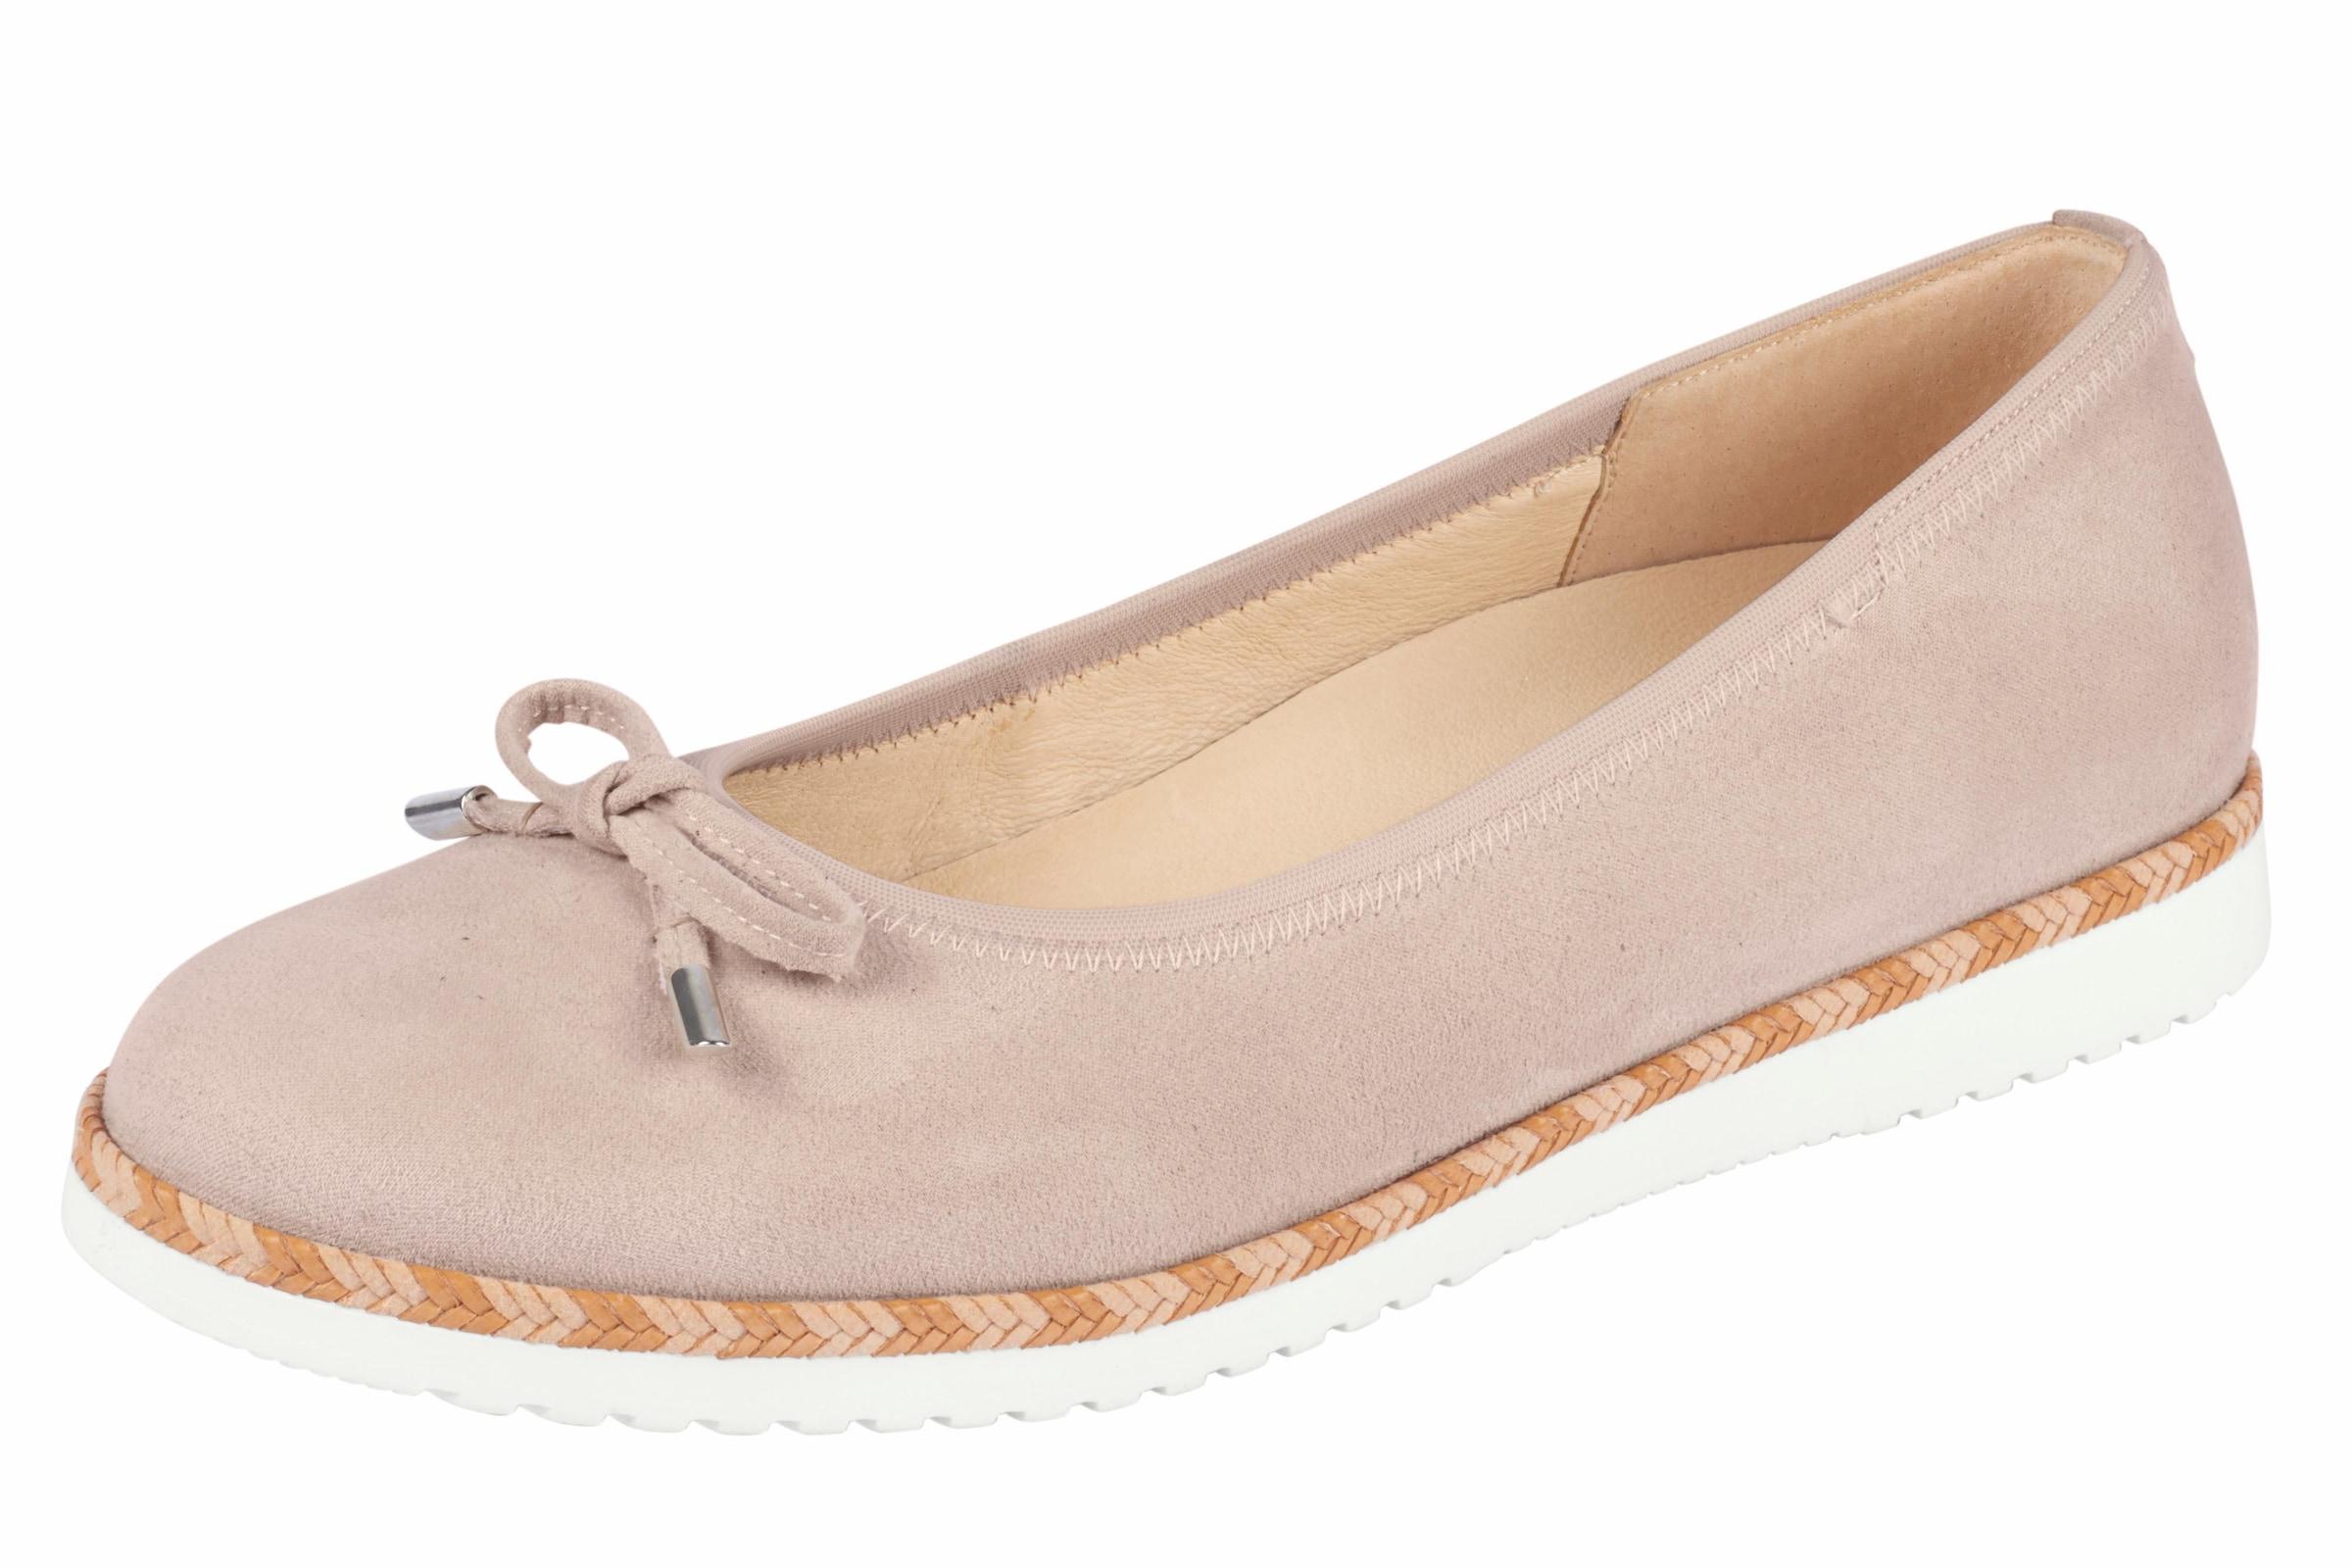 GABOR Comfort Ballerina Verschleißfeste billige Schuhe